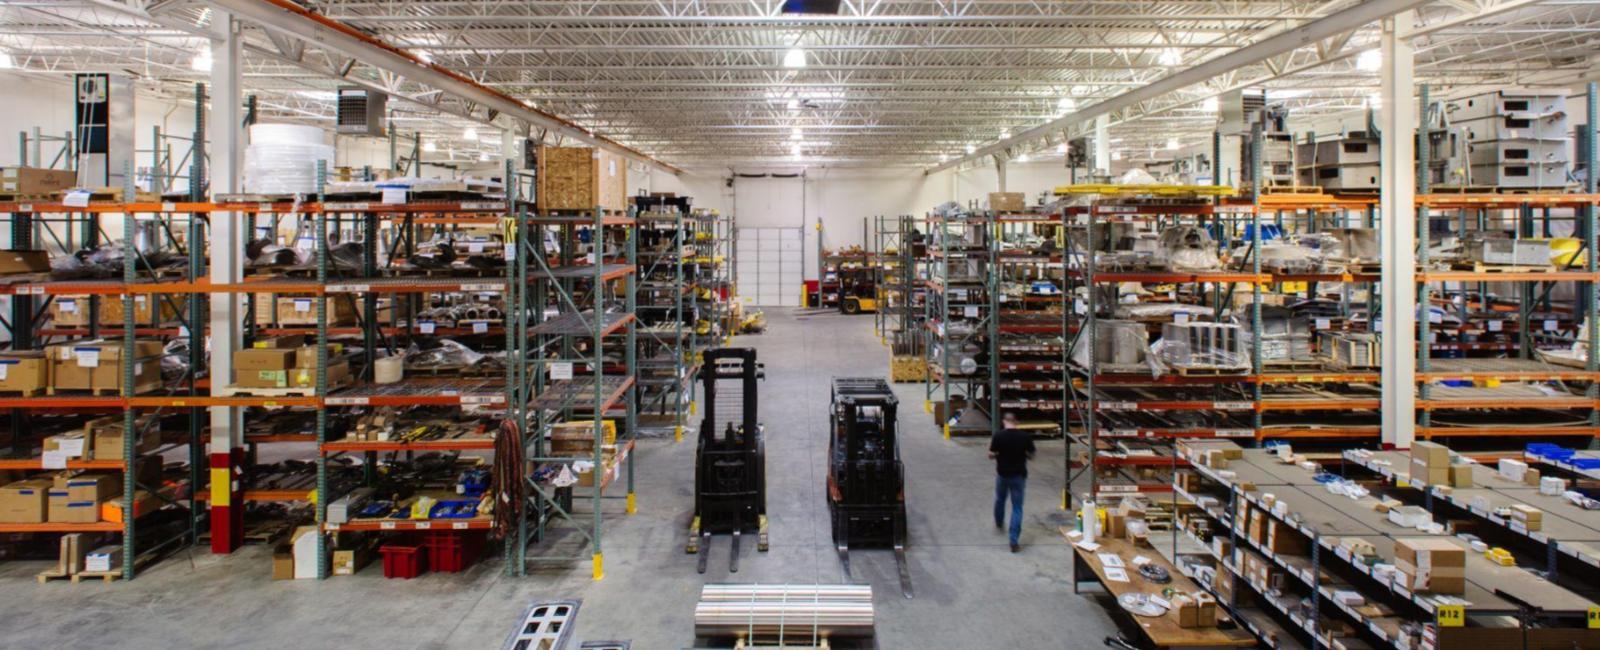 Centrifuge Spare Parts Warehouse